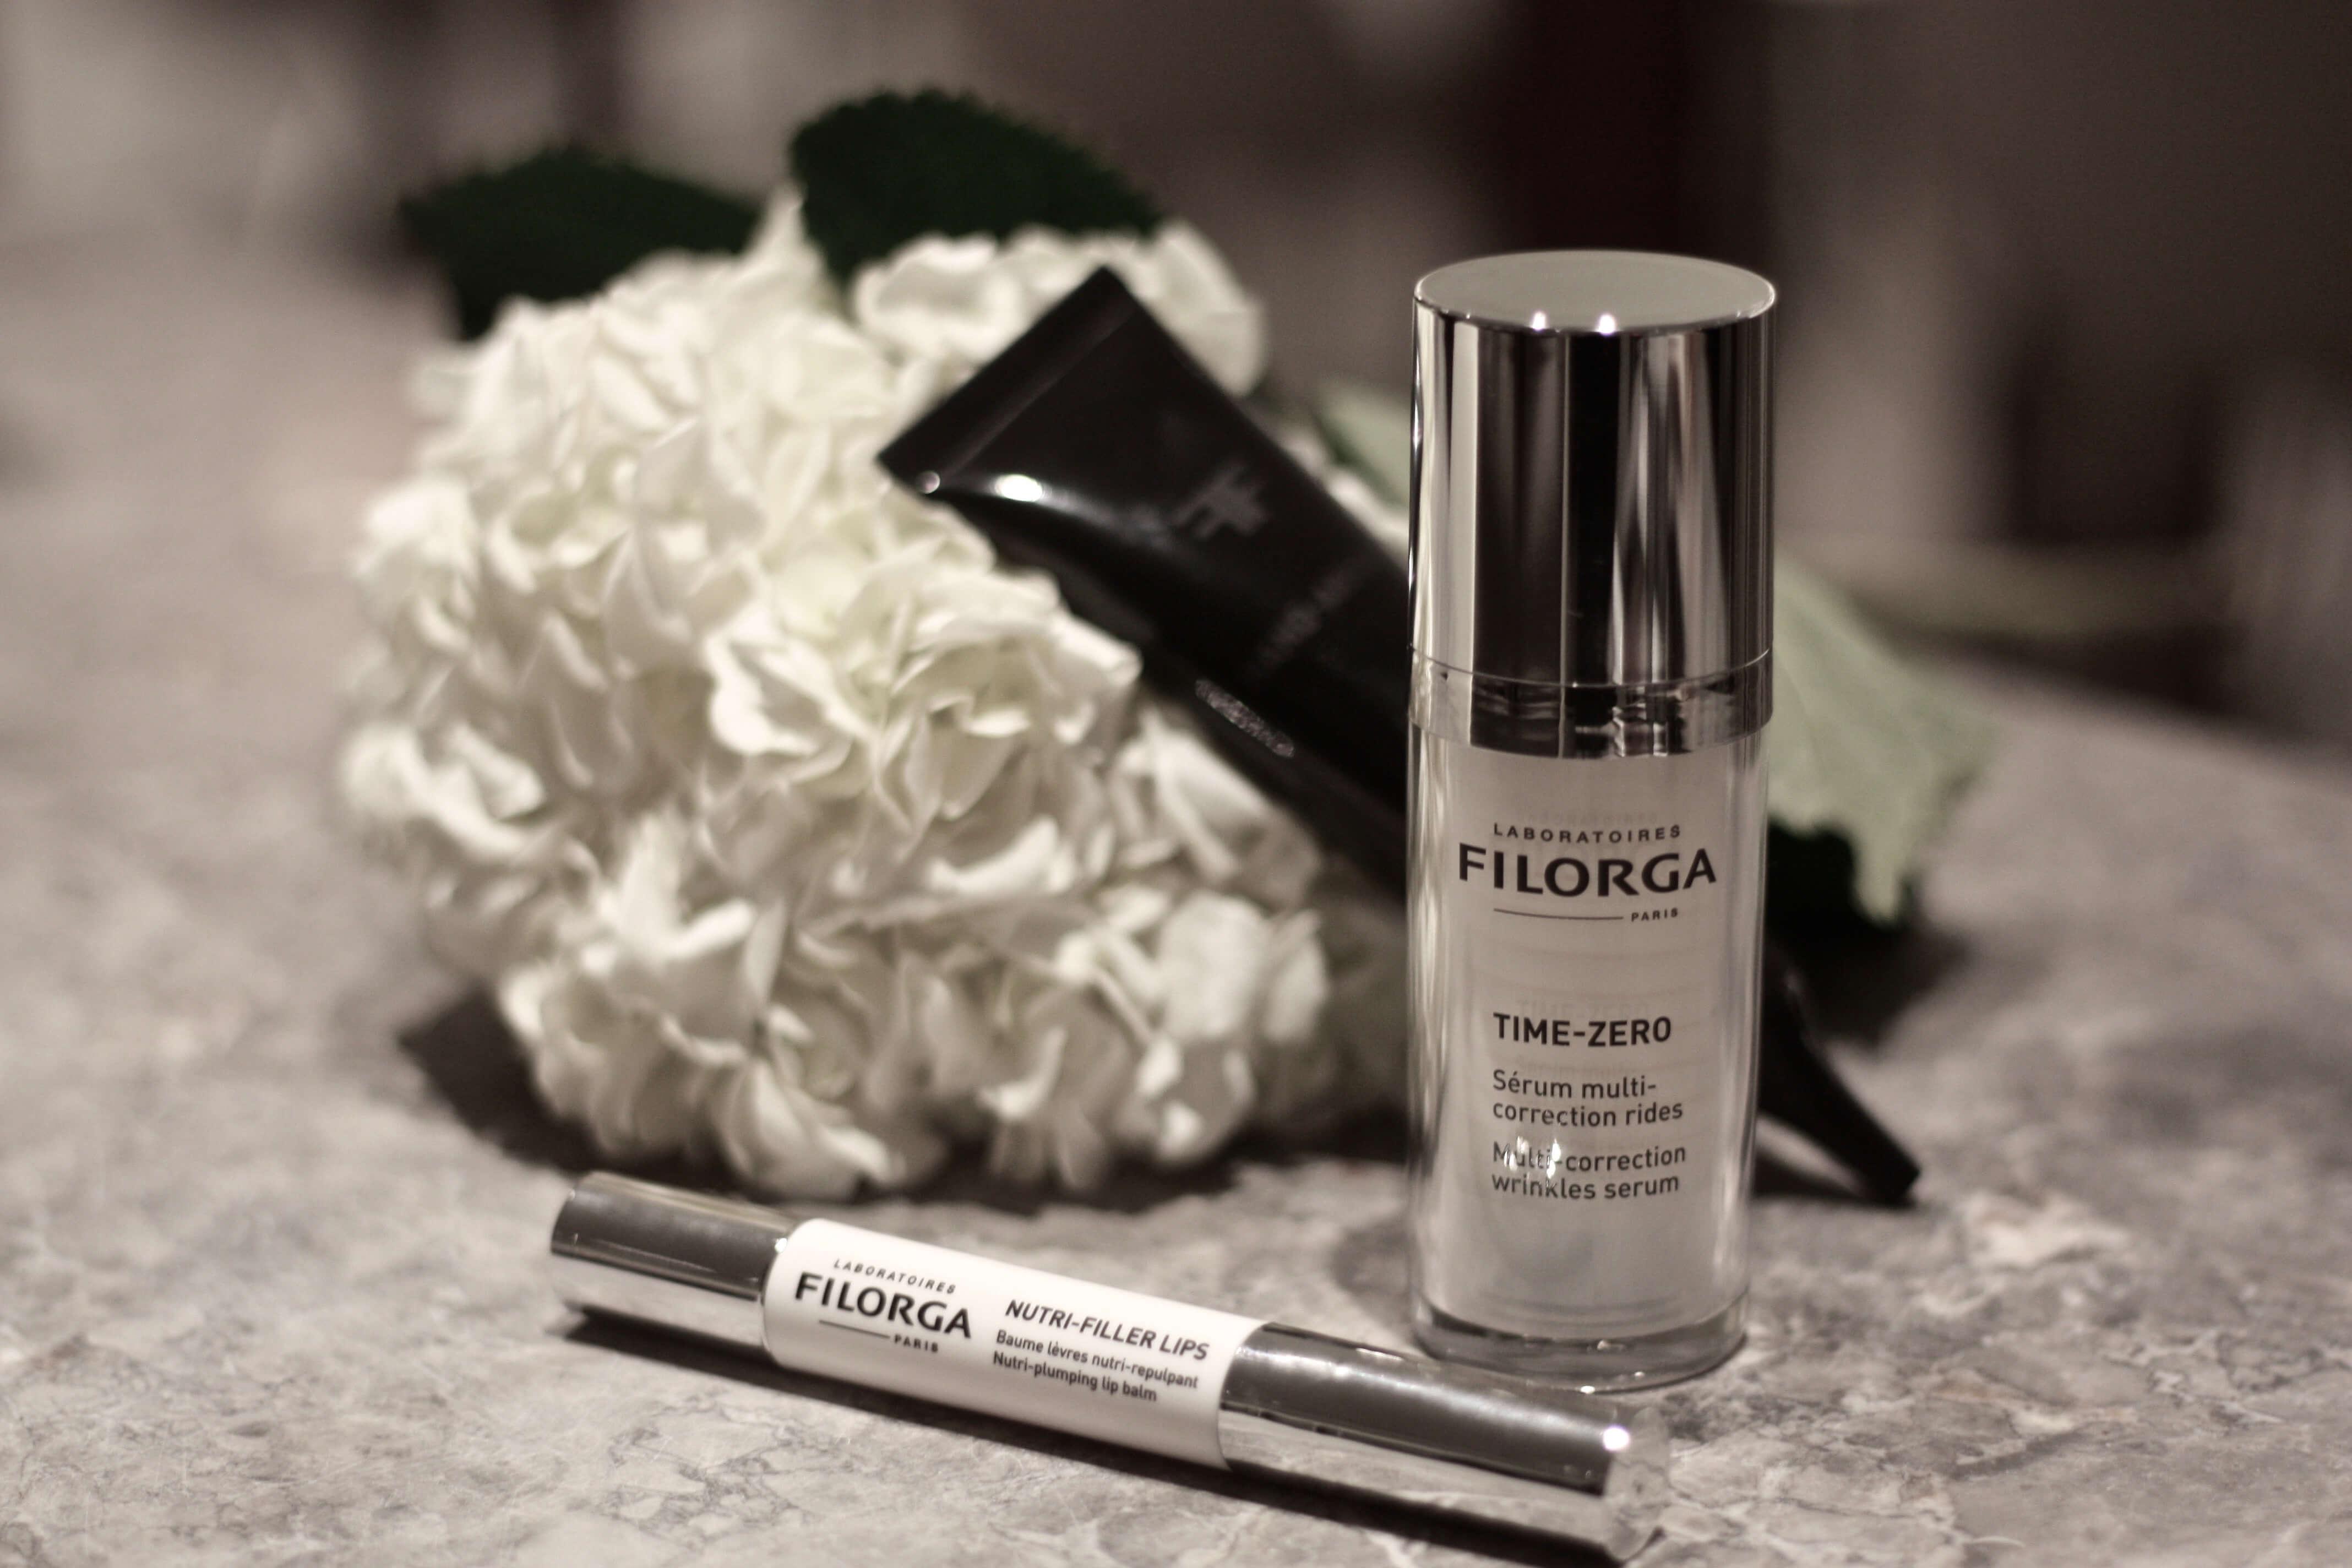 Filorga Extra 33% Off